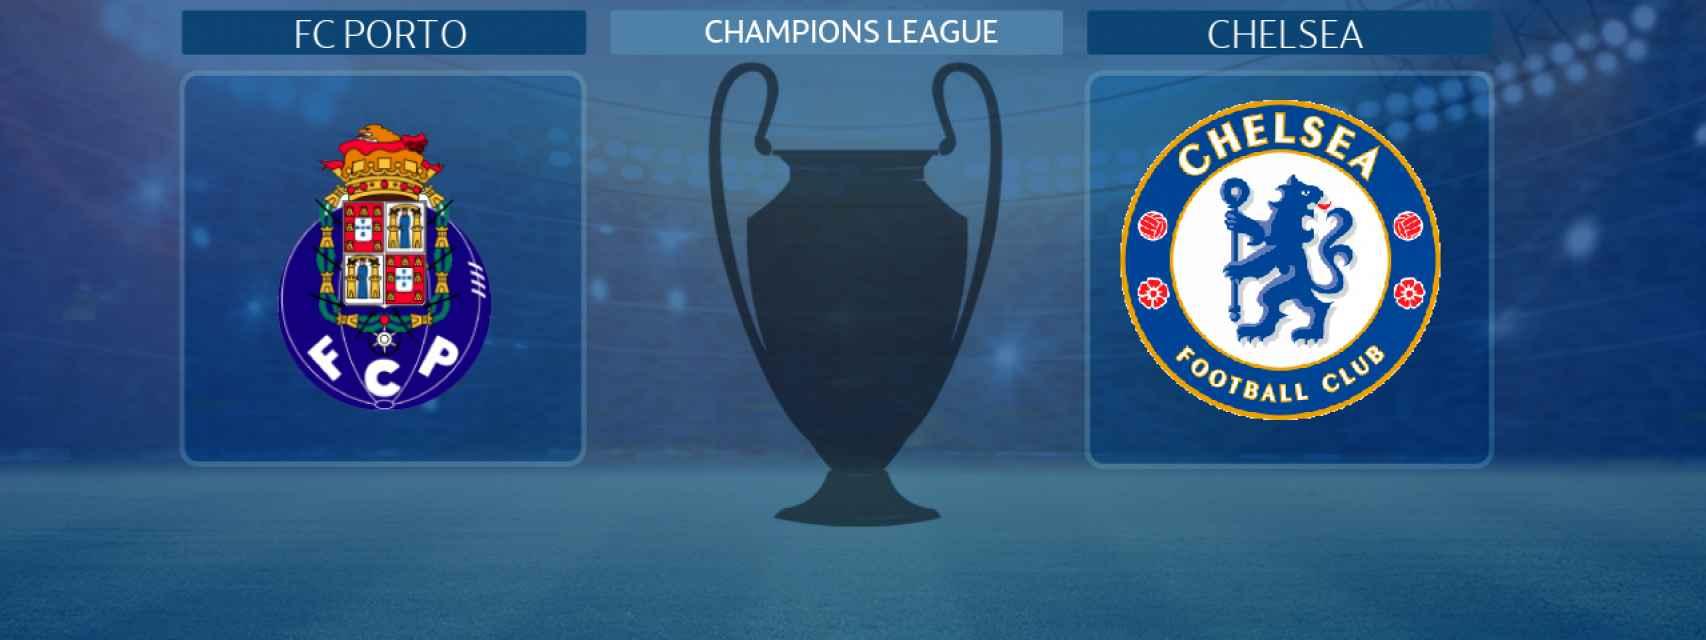 Oporto - Chelsea, partido de la Champions League